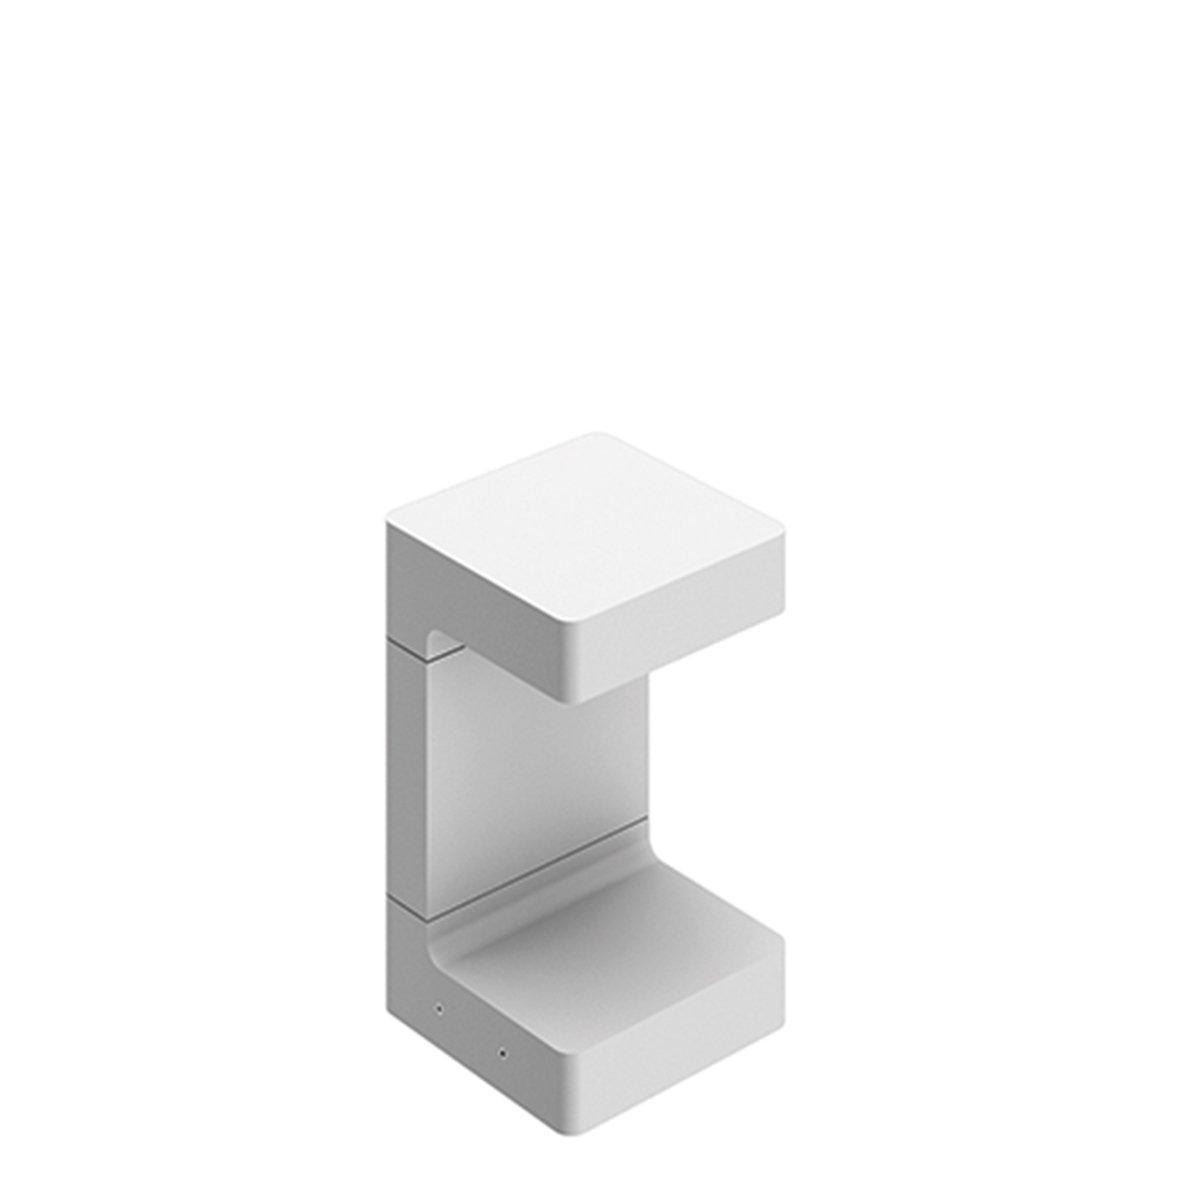 FLOS Casting C150 Outdoor Vloerlamp Wit - 25 cm.